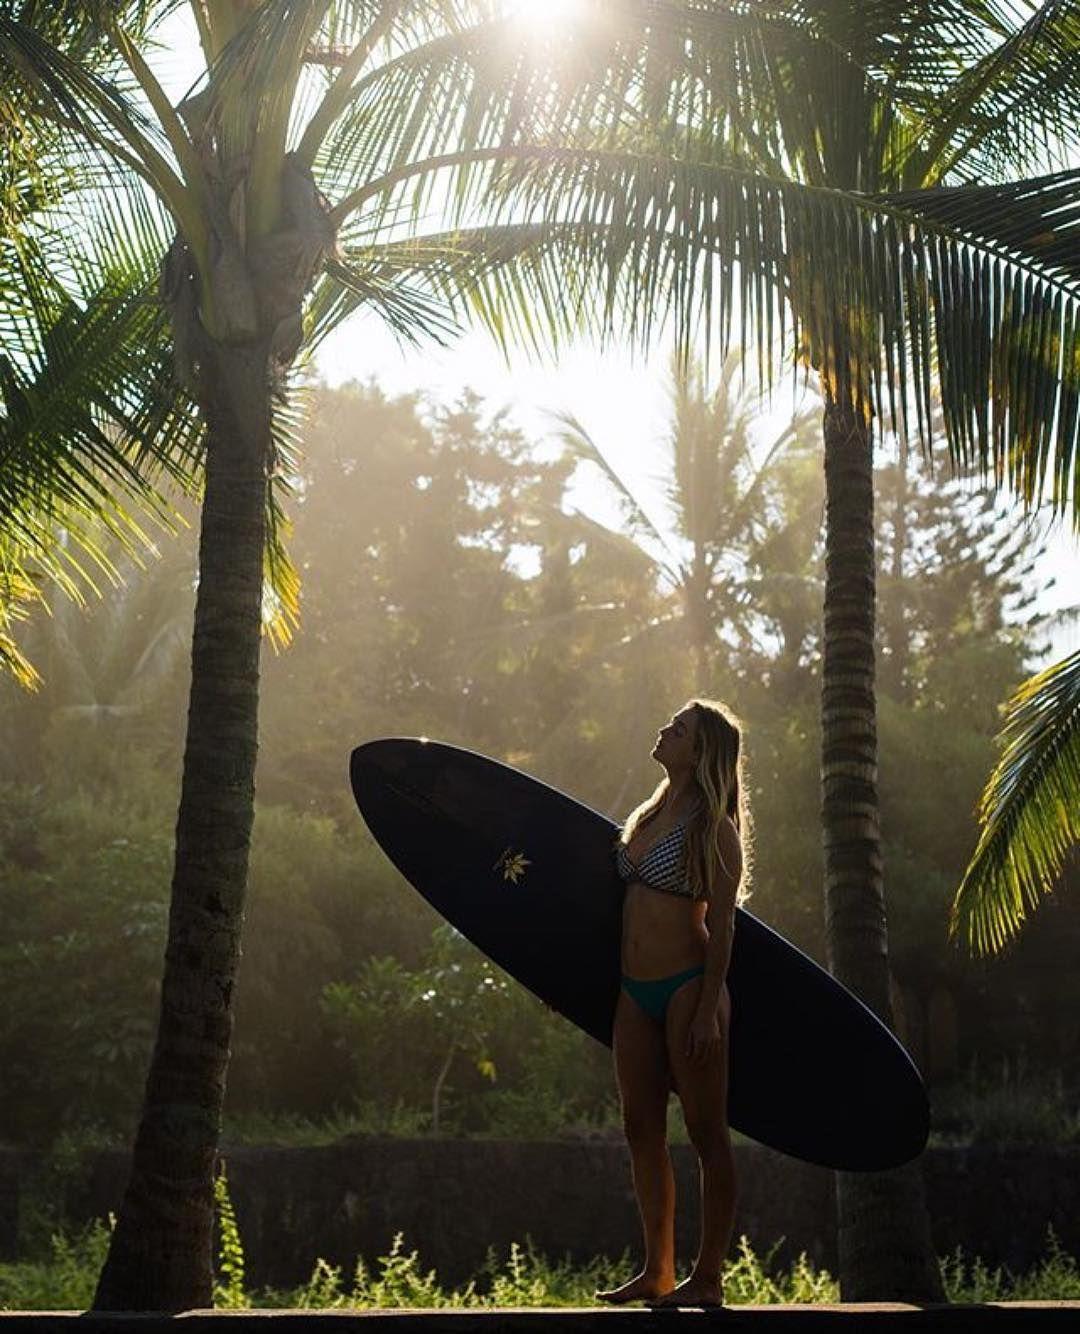 "2,465 Likes, 14 Comments - prAna (@prana) on Instagram: ""You can almost feel the ocean mist. - prAna Ambassador @annaehrgott 📸 @hisarahlee - - - #surf…"""